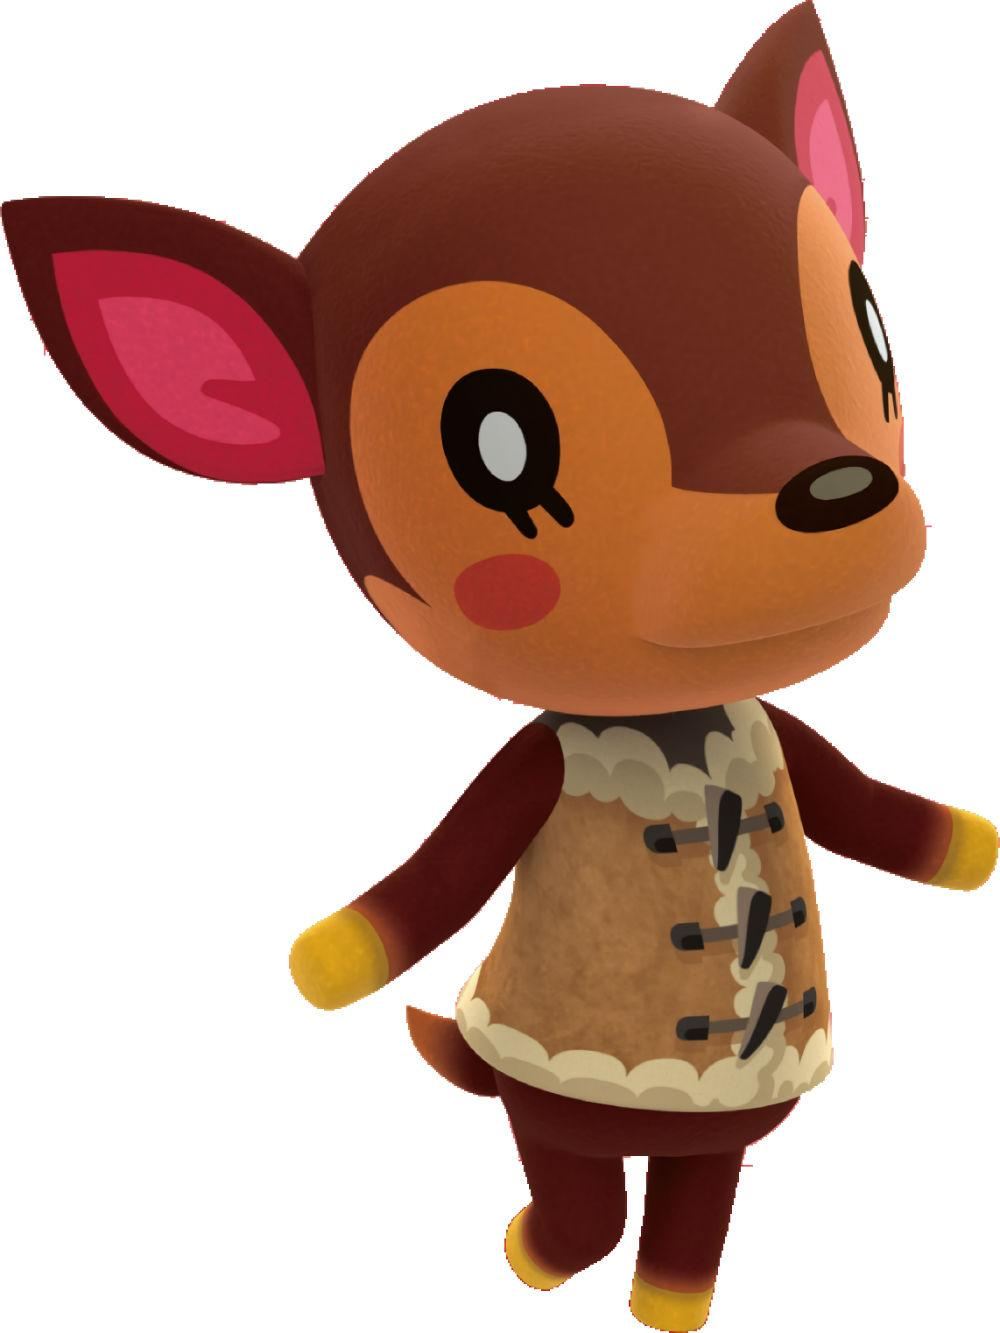 Top 15 Animal Crossing Best Villagers | GAMERS DECIDE